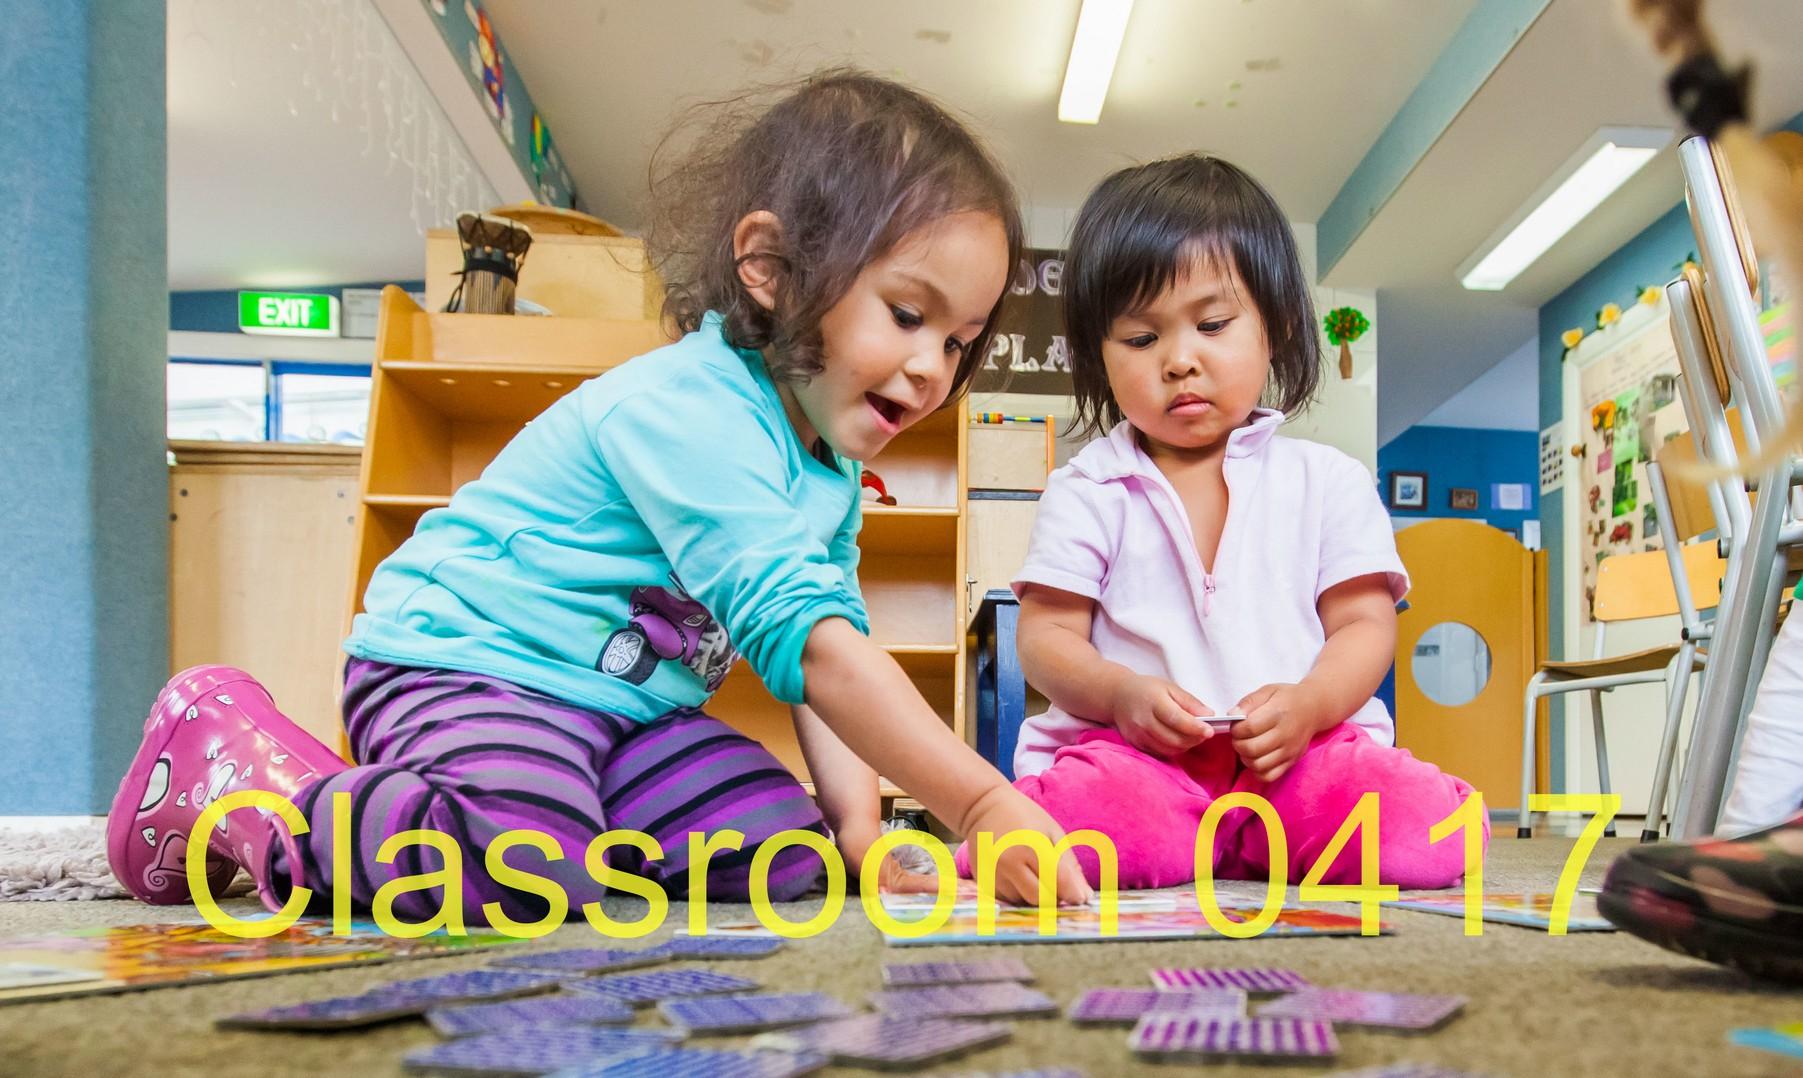 Classroom 0417